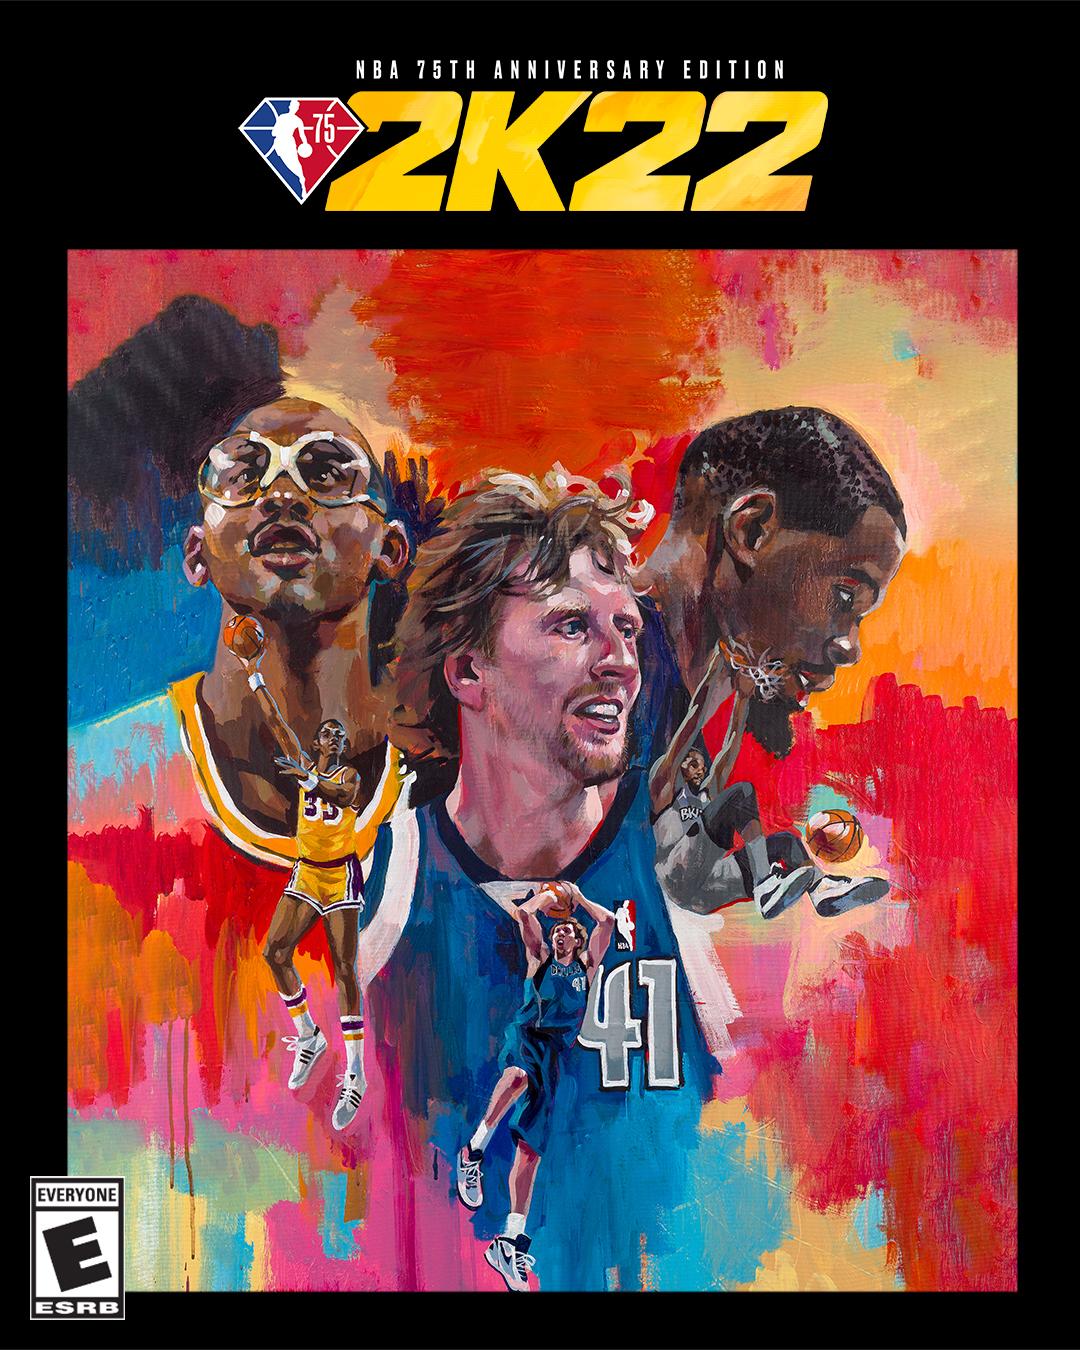 Luka Donic Kareem Abdul Jabbar Dirk Nowitzki And Kevin Durant Are Nba 2k22 Cover Athletes Shacknews